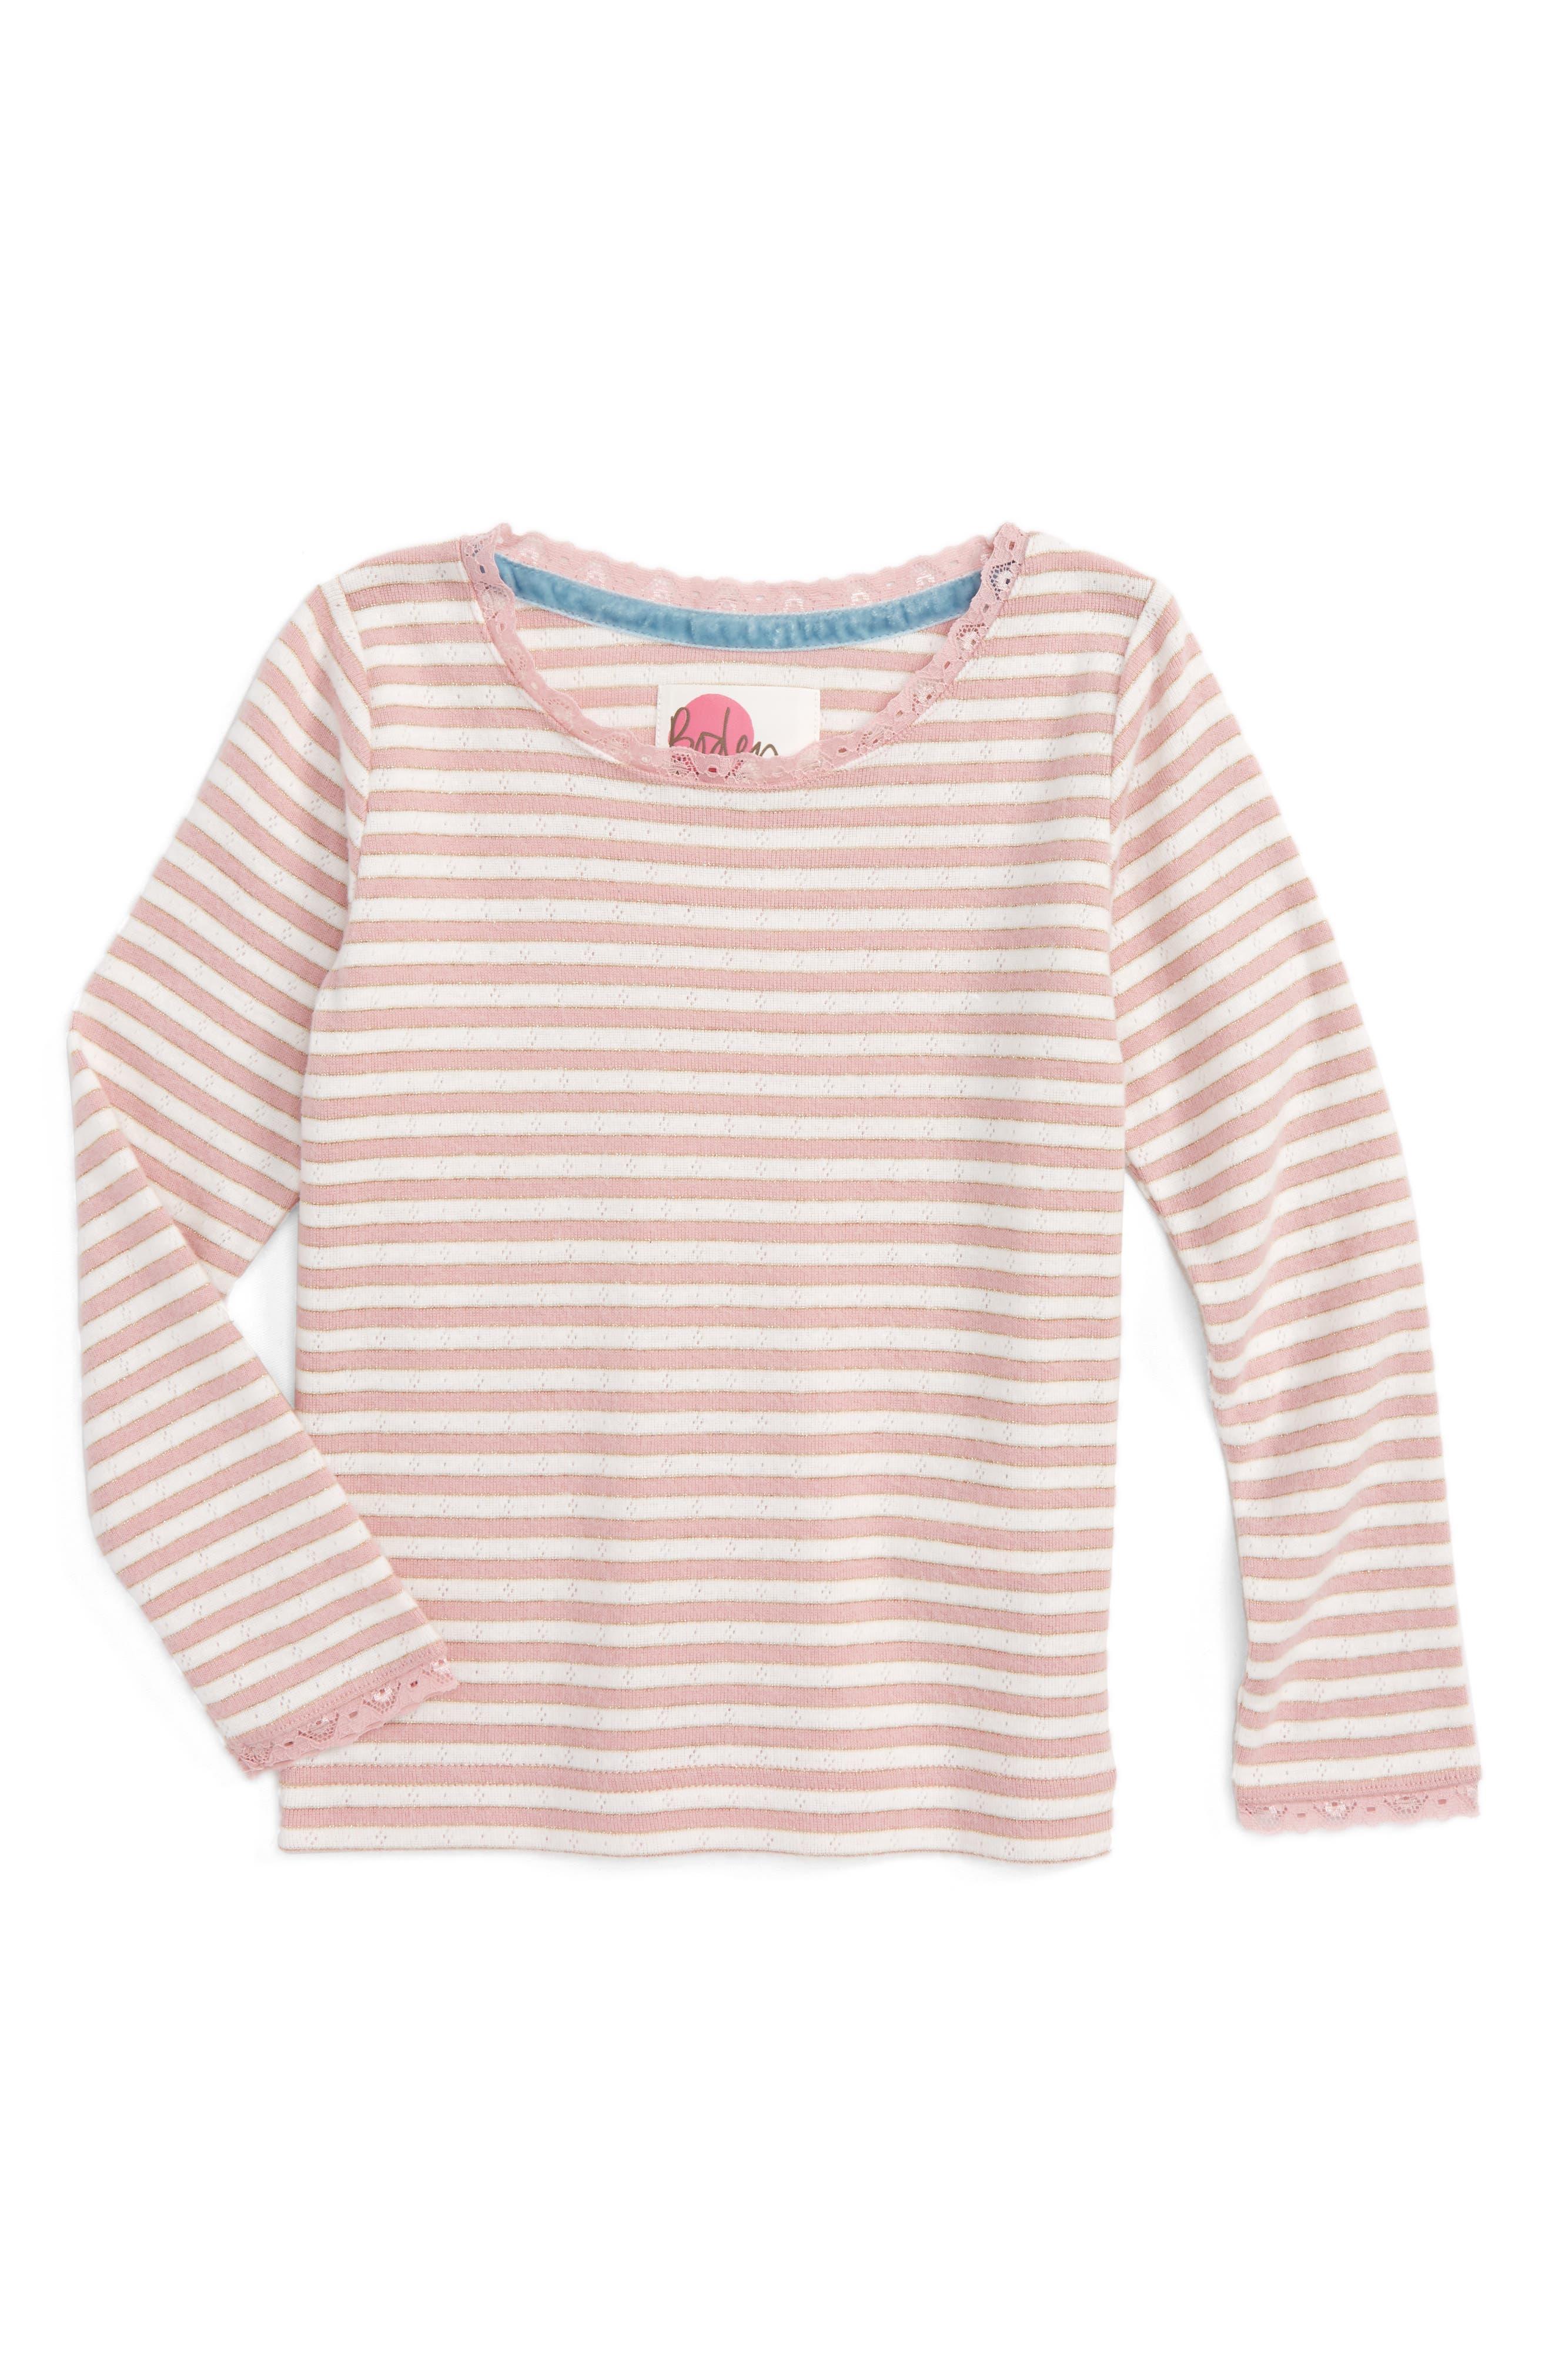 Main Image - Mini Boden Sparkly Pointelle Tee (Toddler Girls, Little Girls & Big Girls)